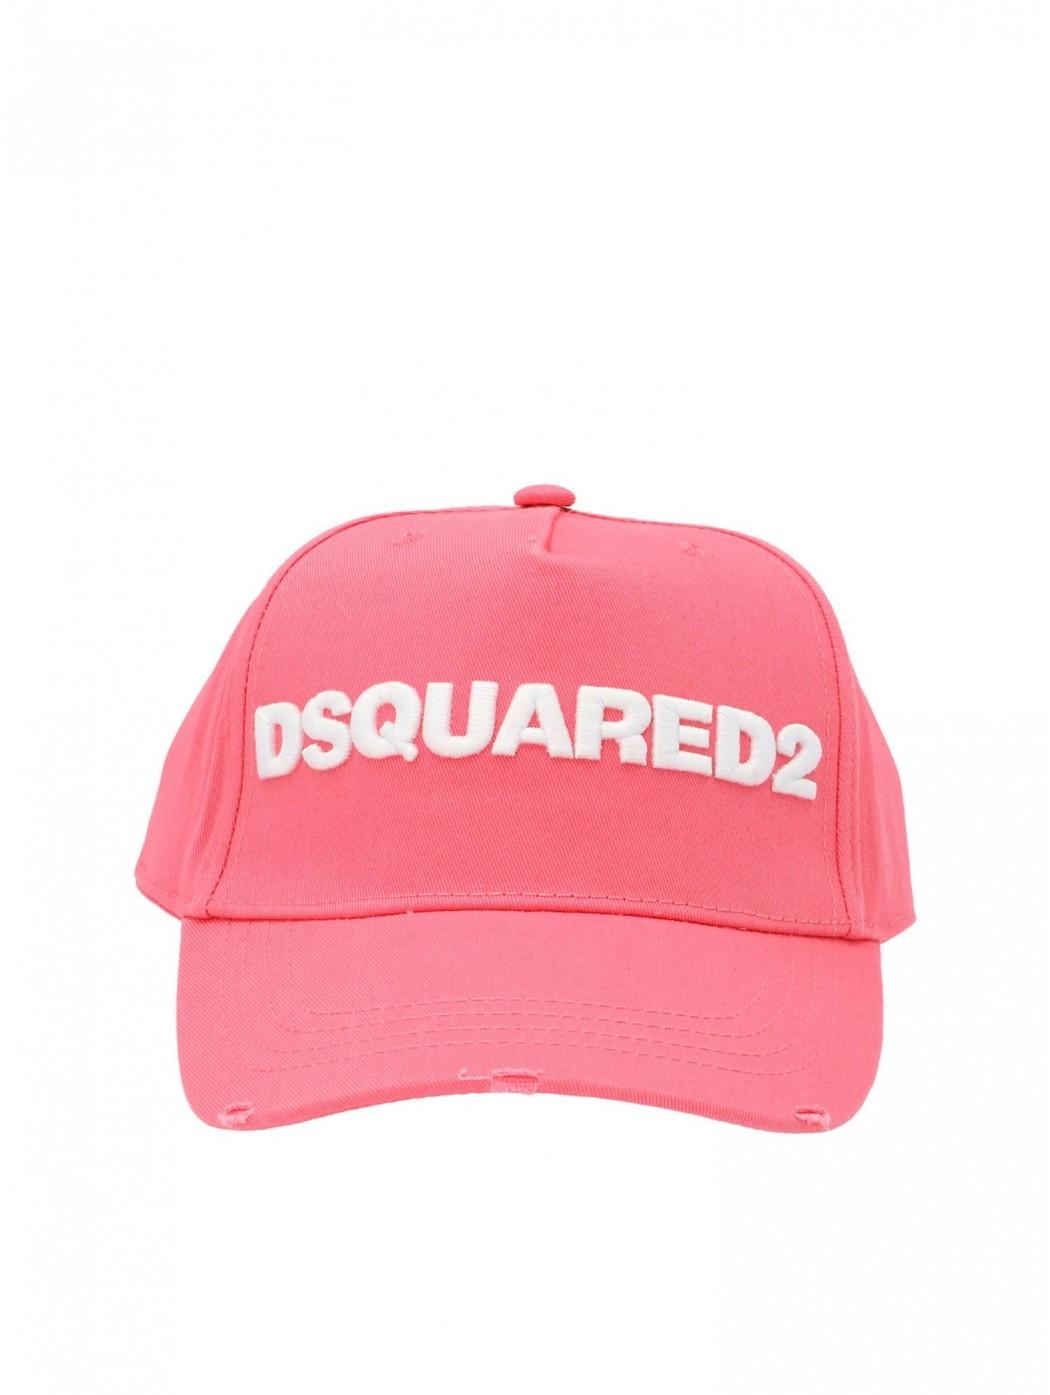 BASEBALL CAP DSQUARED2 BCW002805C00001 M1972